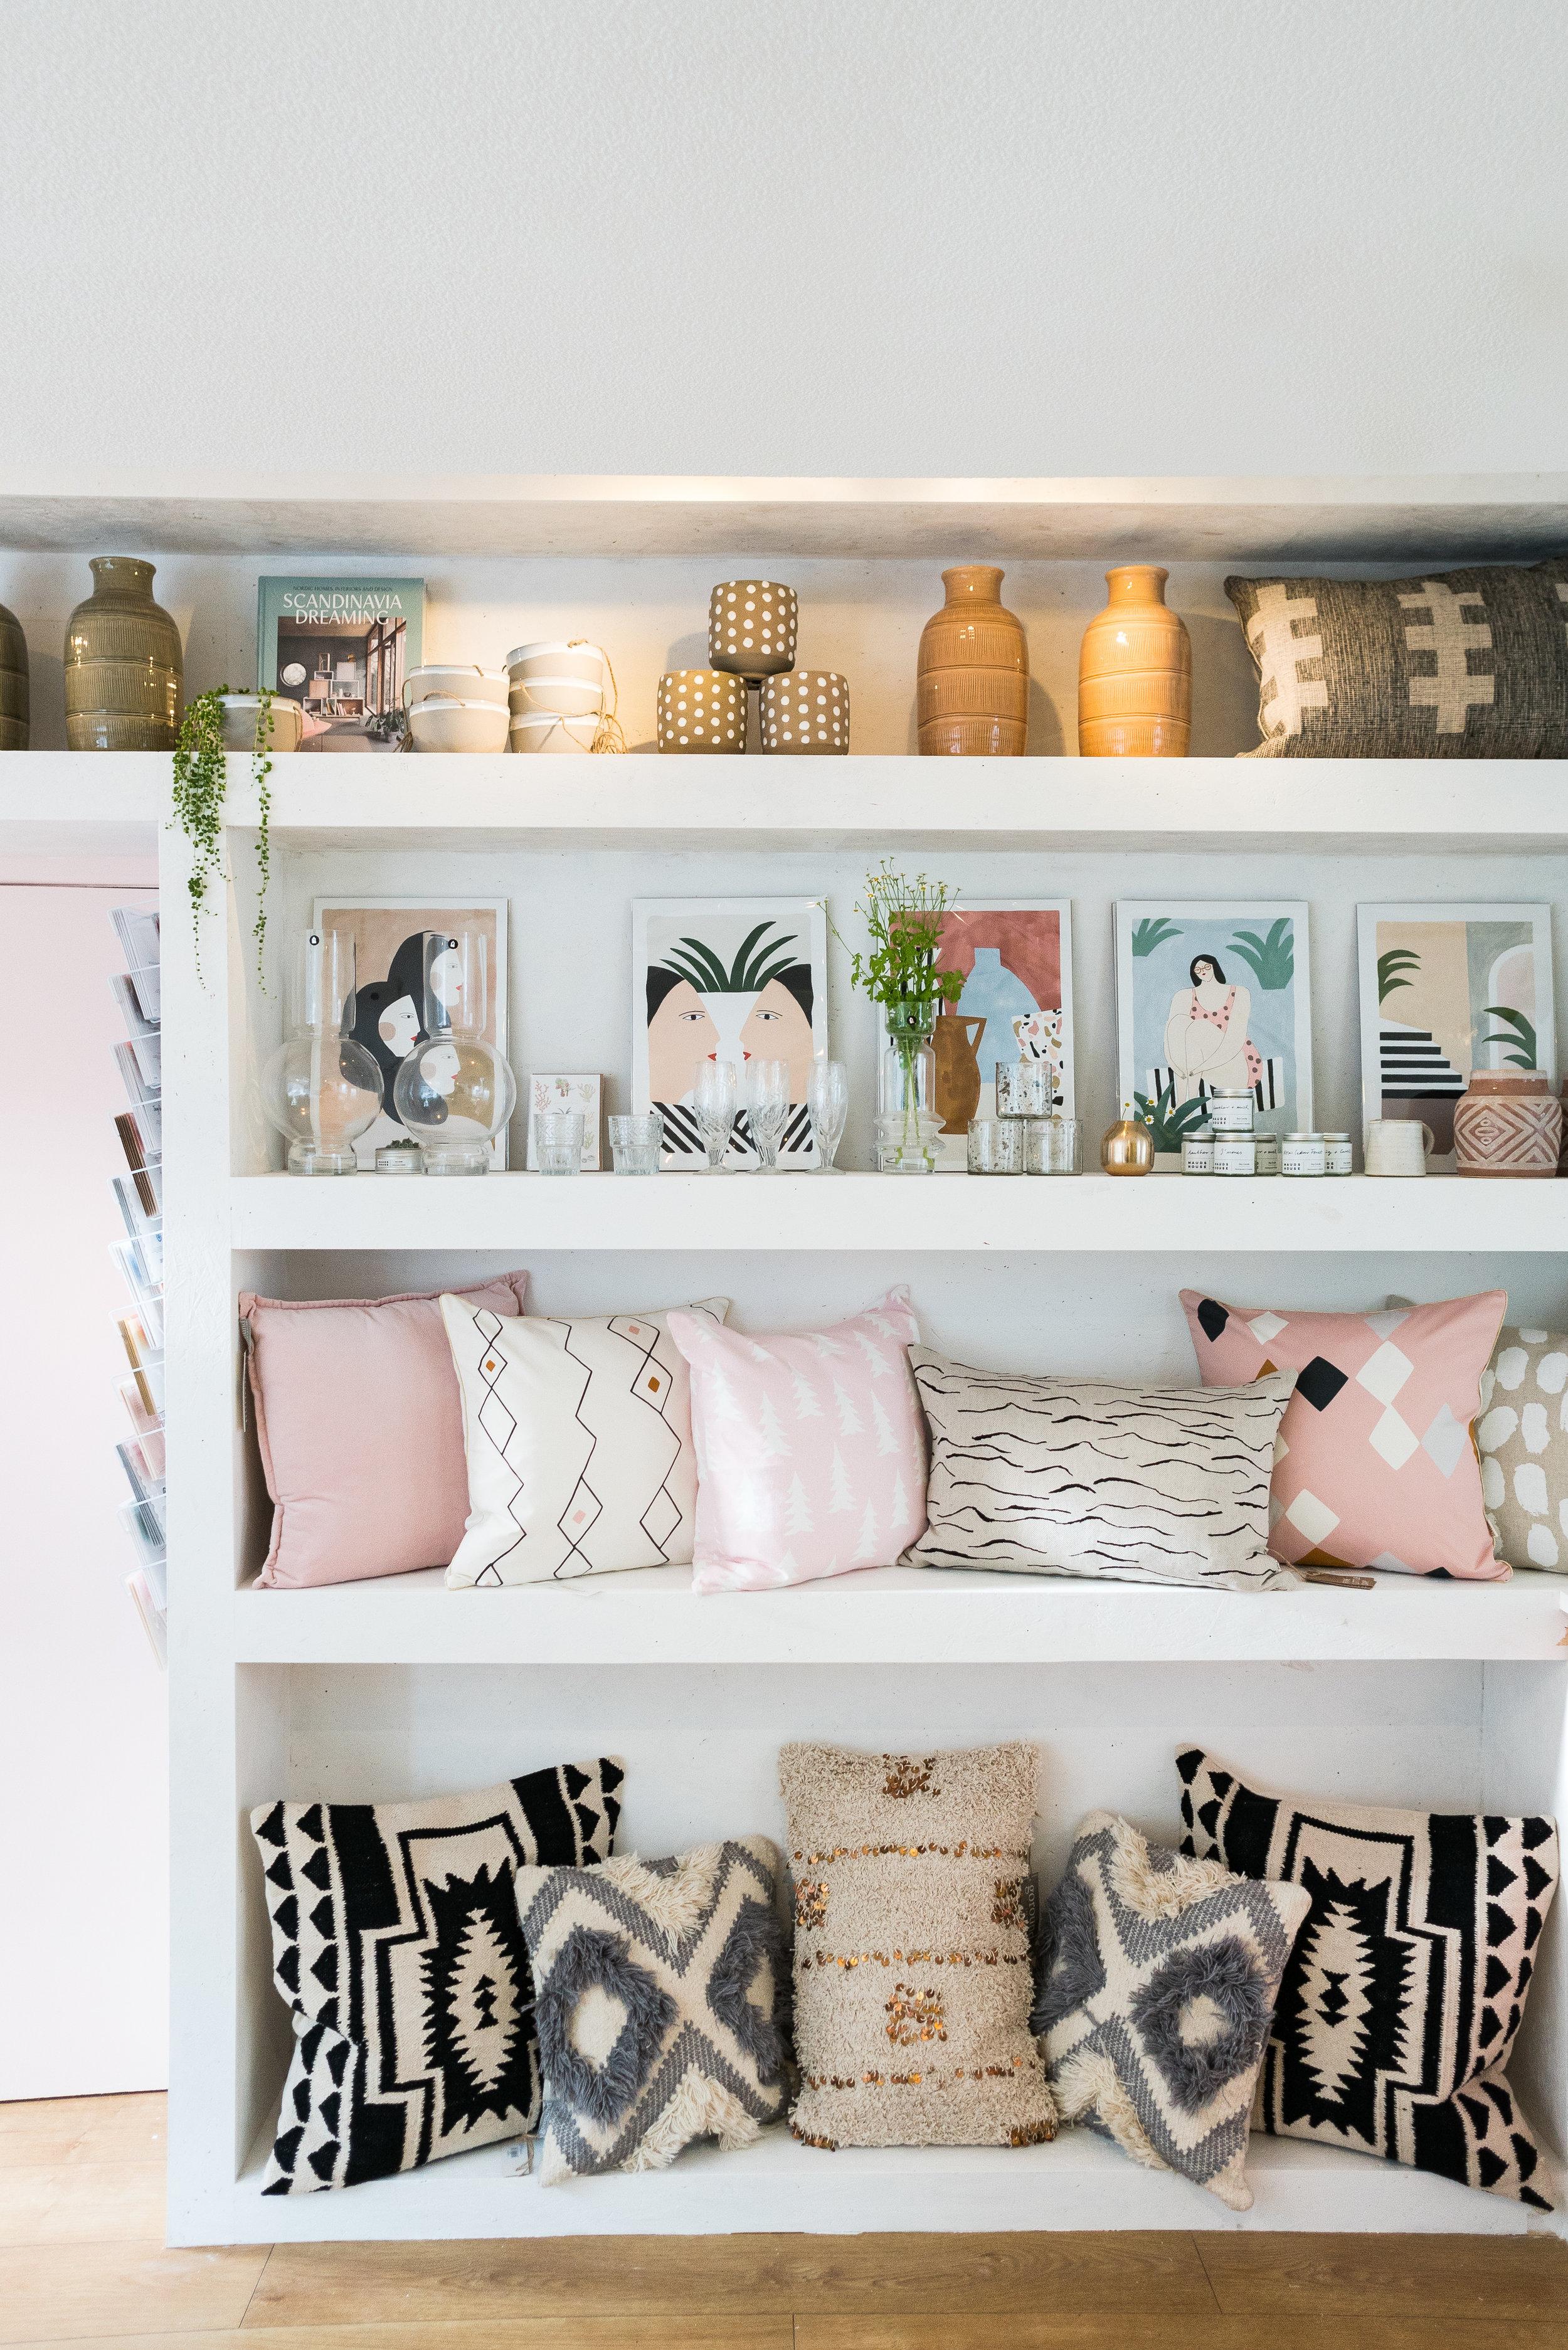 Shopkeeper Spotlight: Maud's House